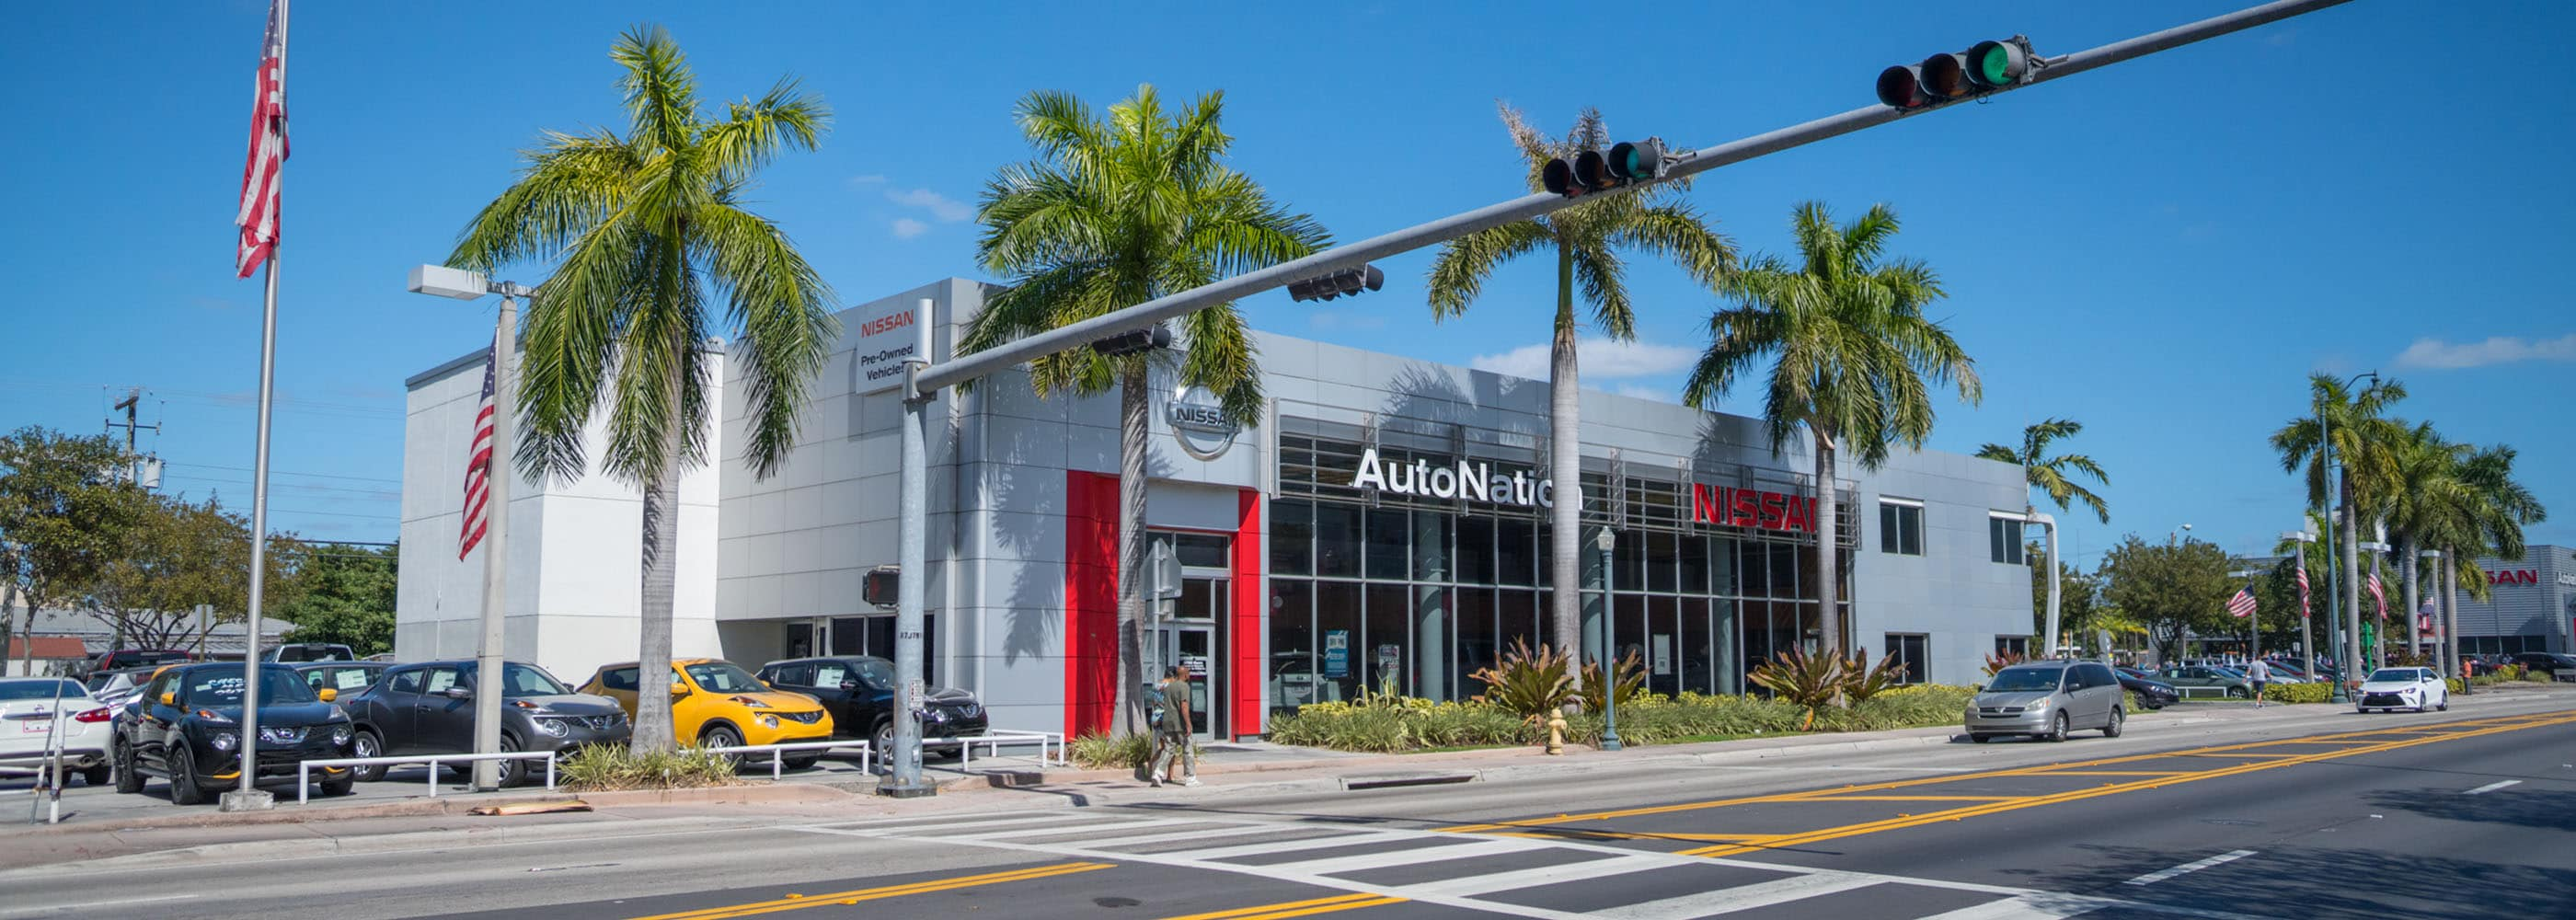 Marvelous AutoNation Nissan Miami